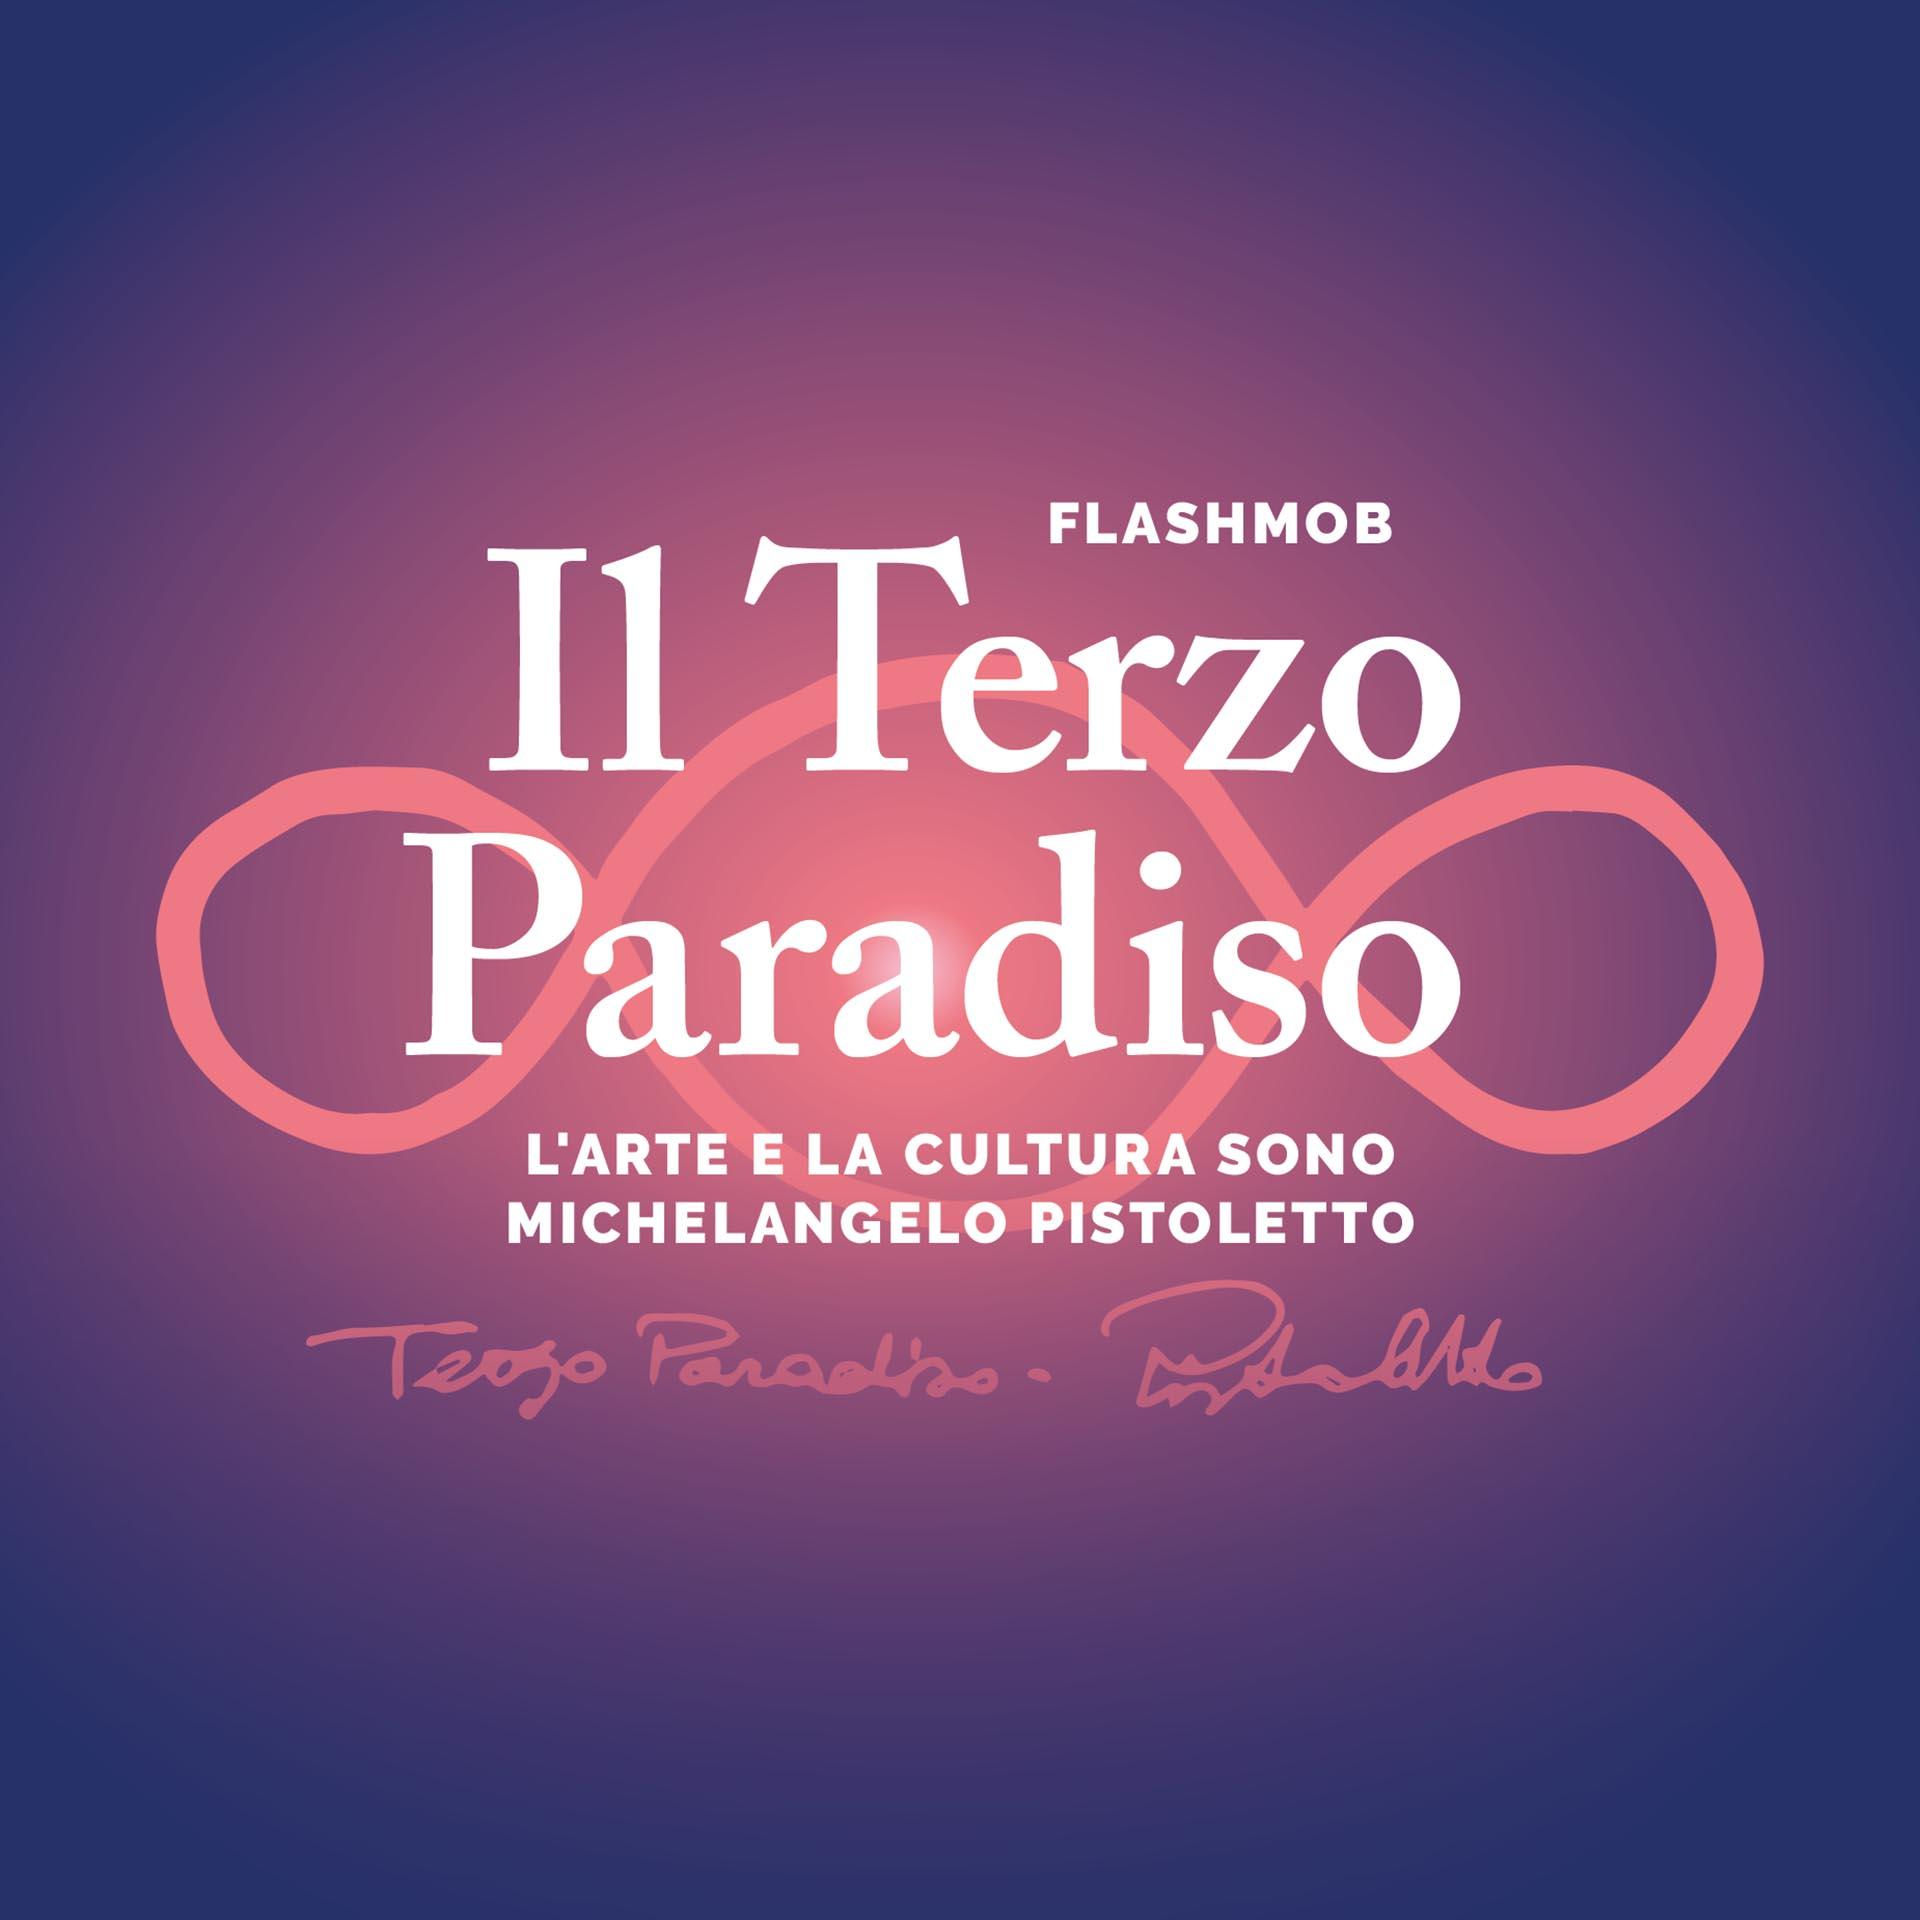 """Il Terzo Paradiso"" – Flashmob"